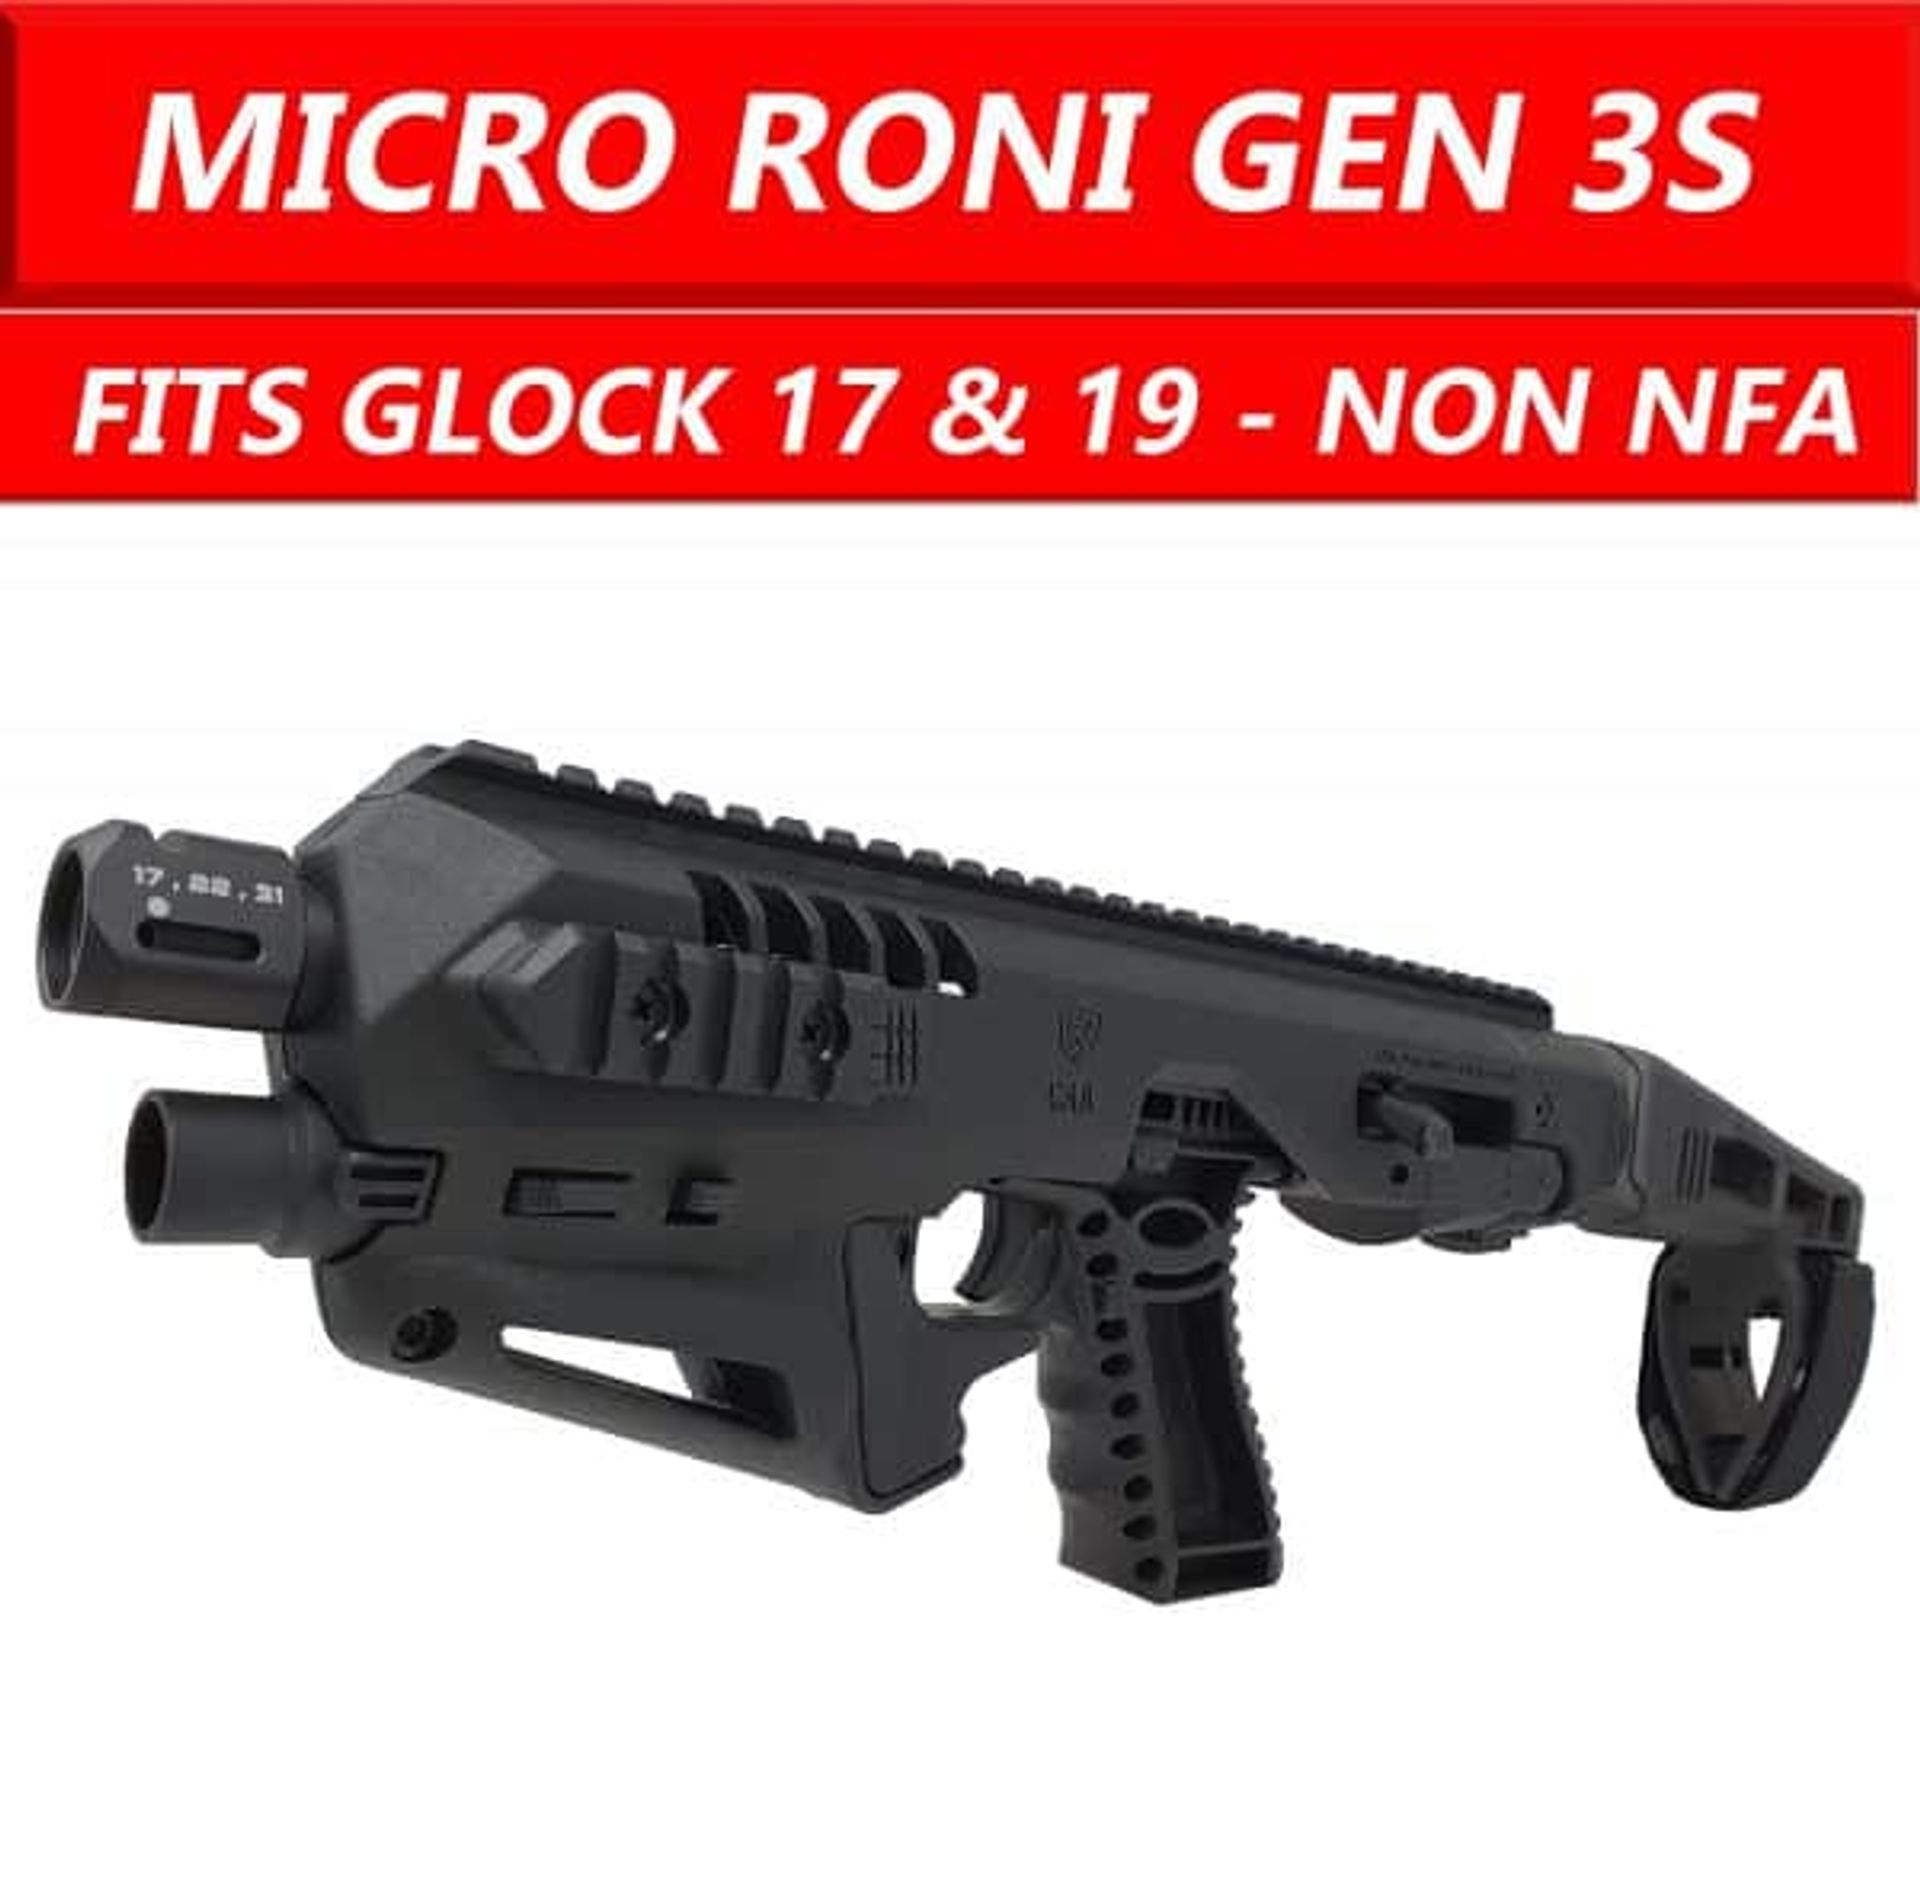 Micro Roni Gen 3S